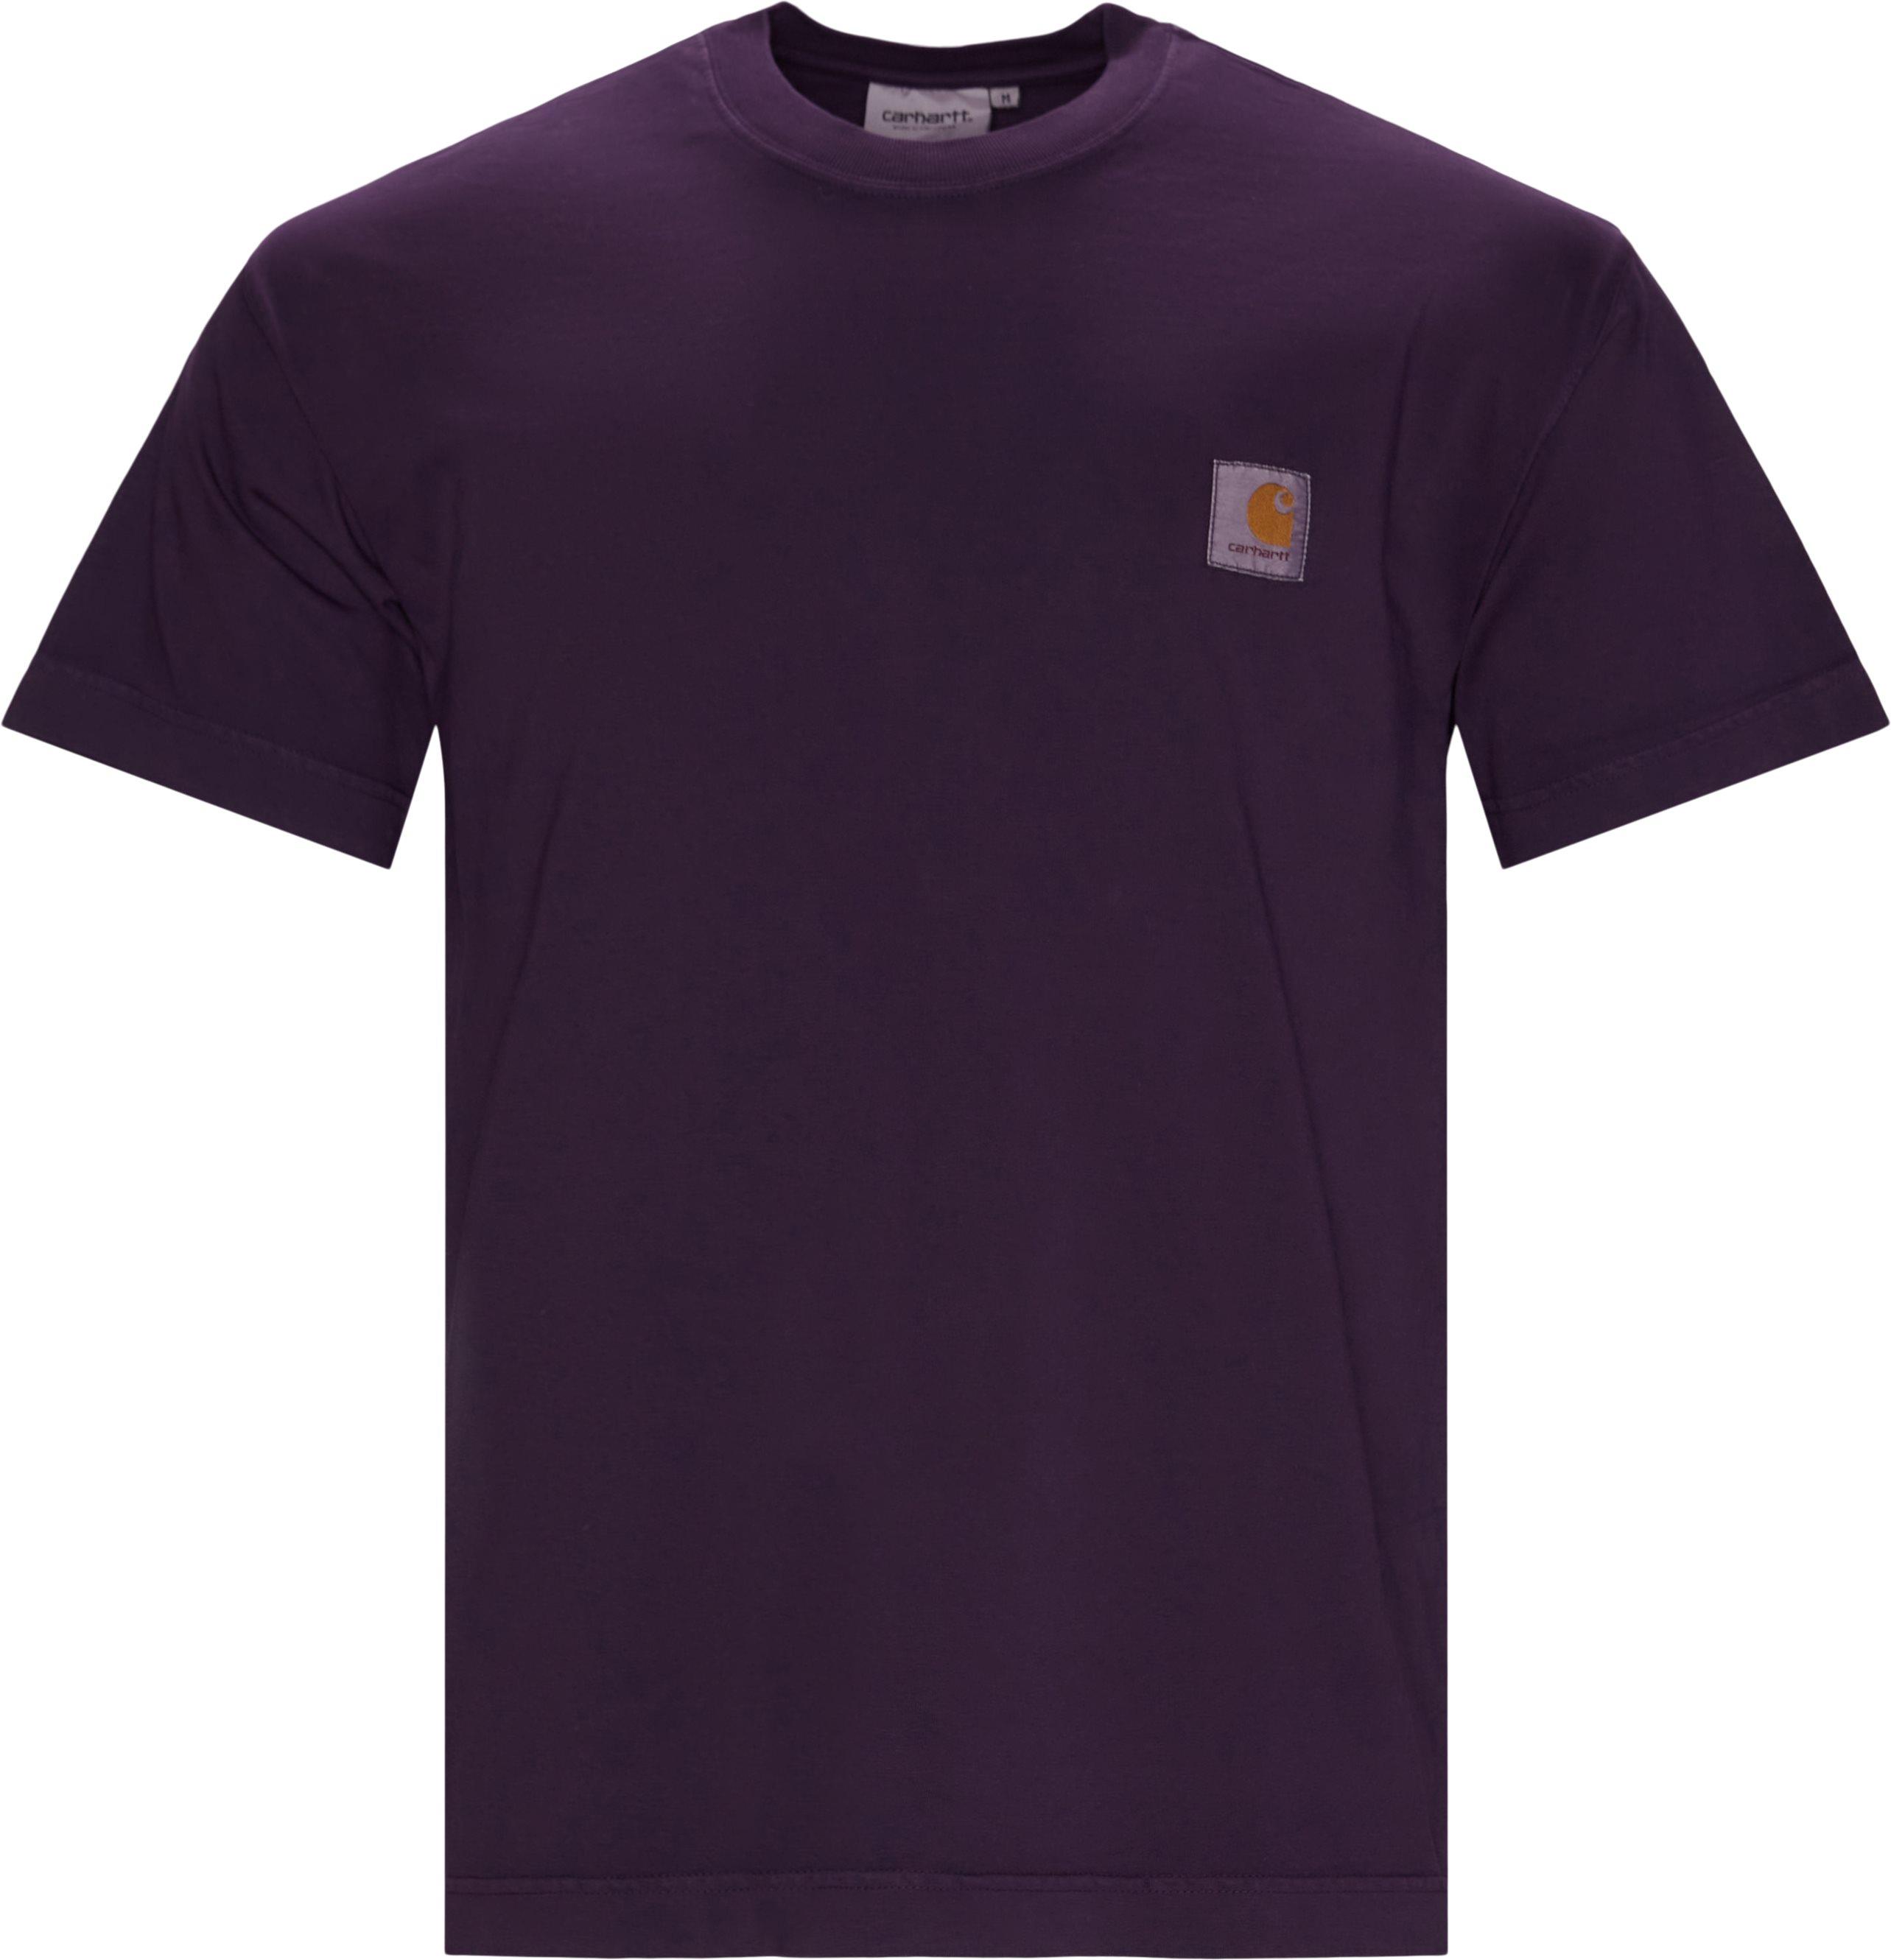 Vista Tee - T-shirts - Regular fit - Lila